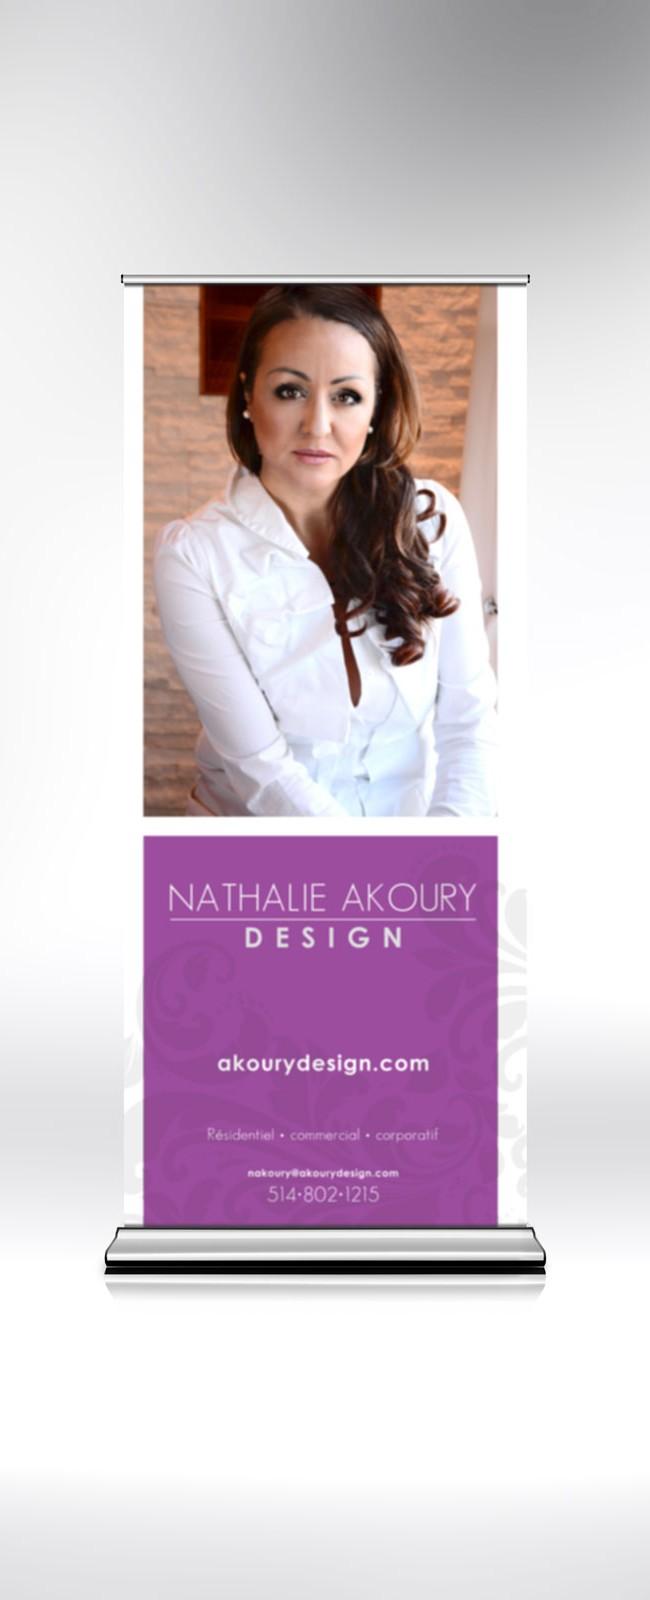 Nathalie Akoury